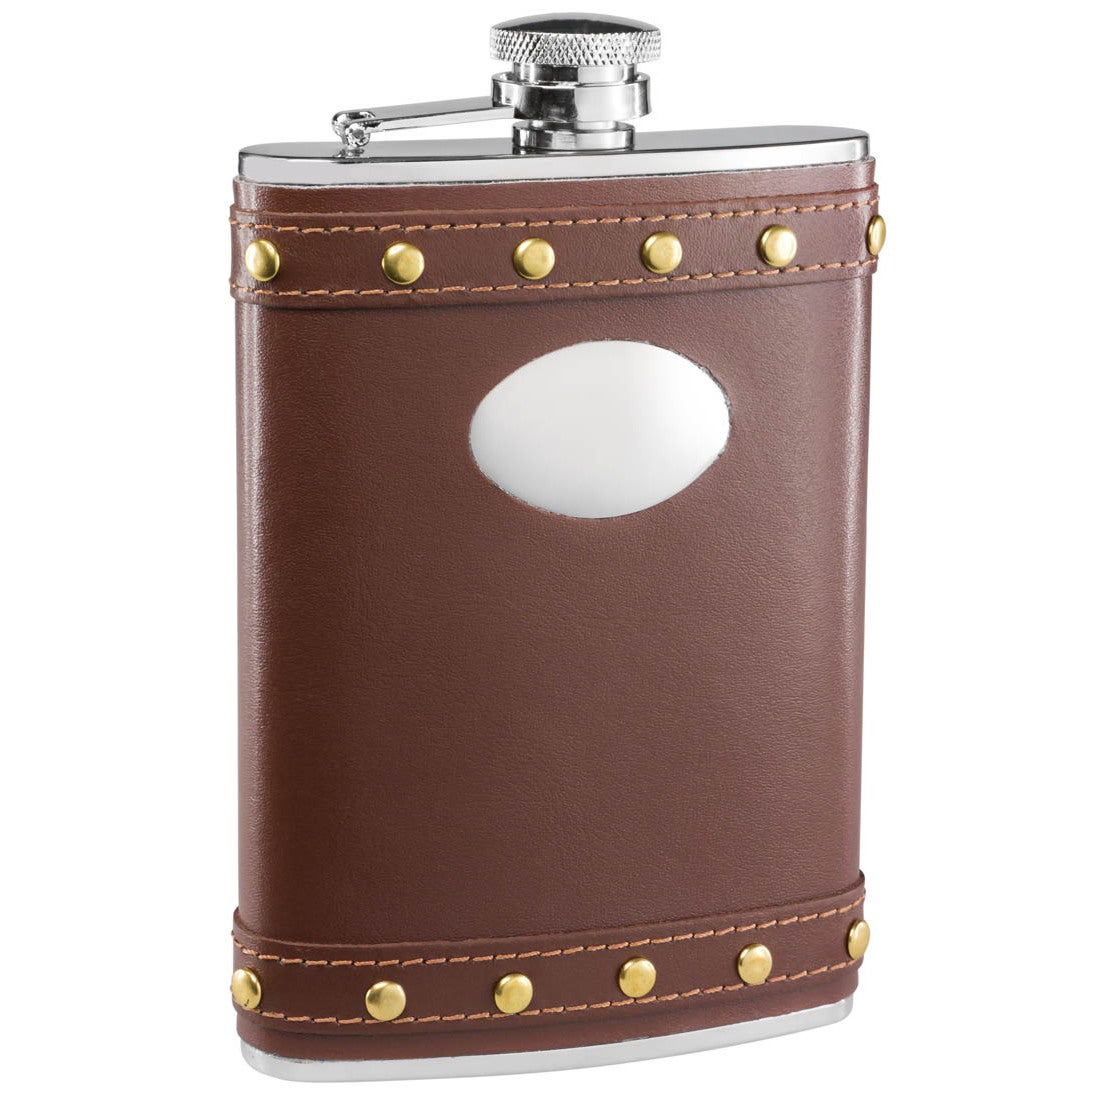 Visol Rocker Brown Leather Studded Liquor Flask - 8 ounce...